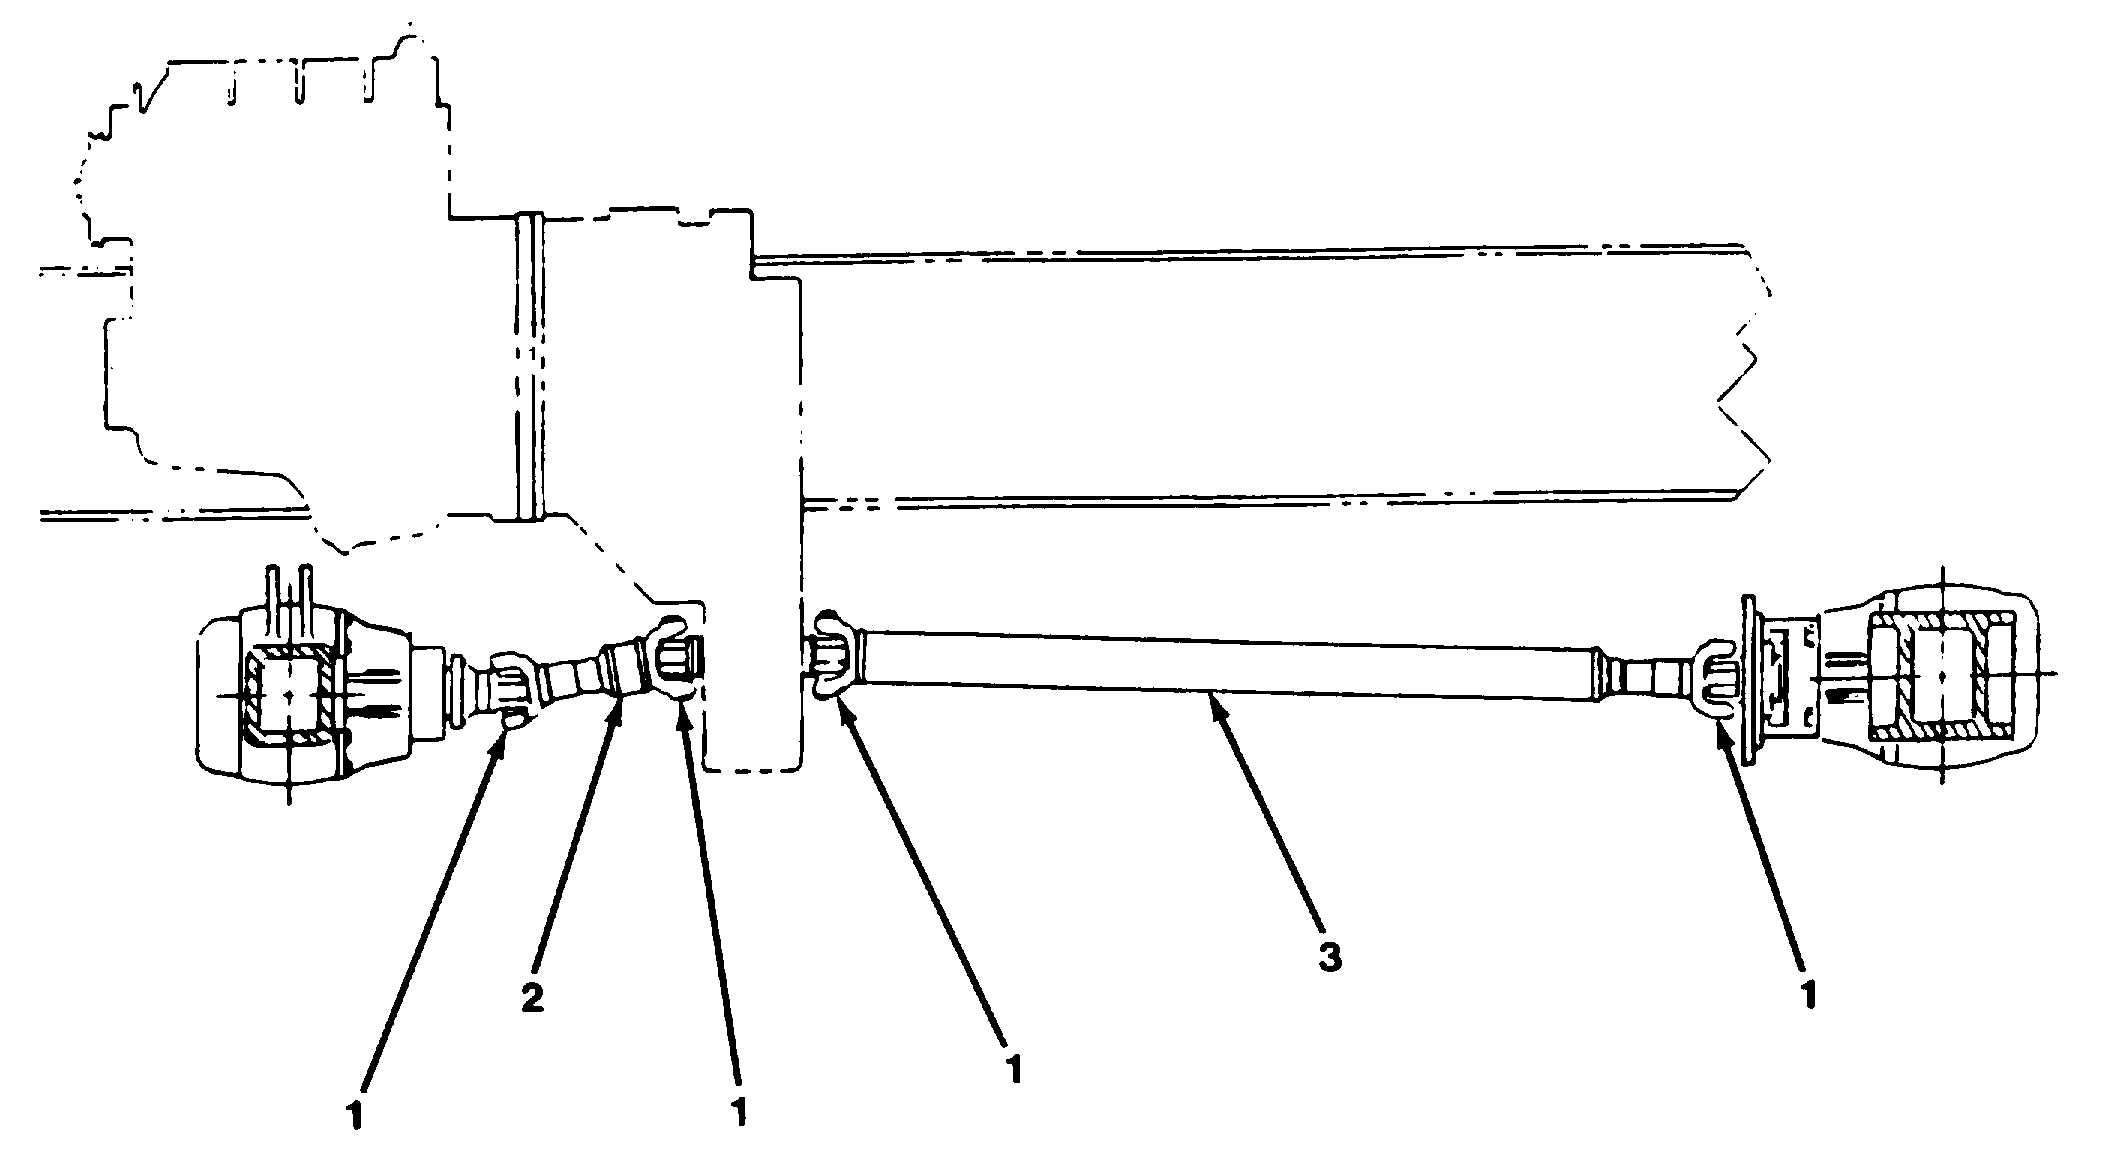 Figure 8-1. Drive Shaft Assembly